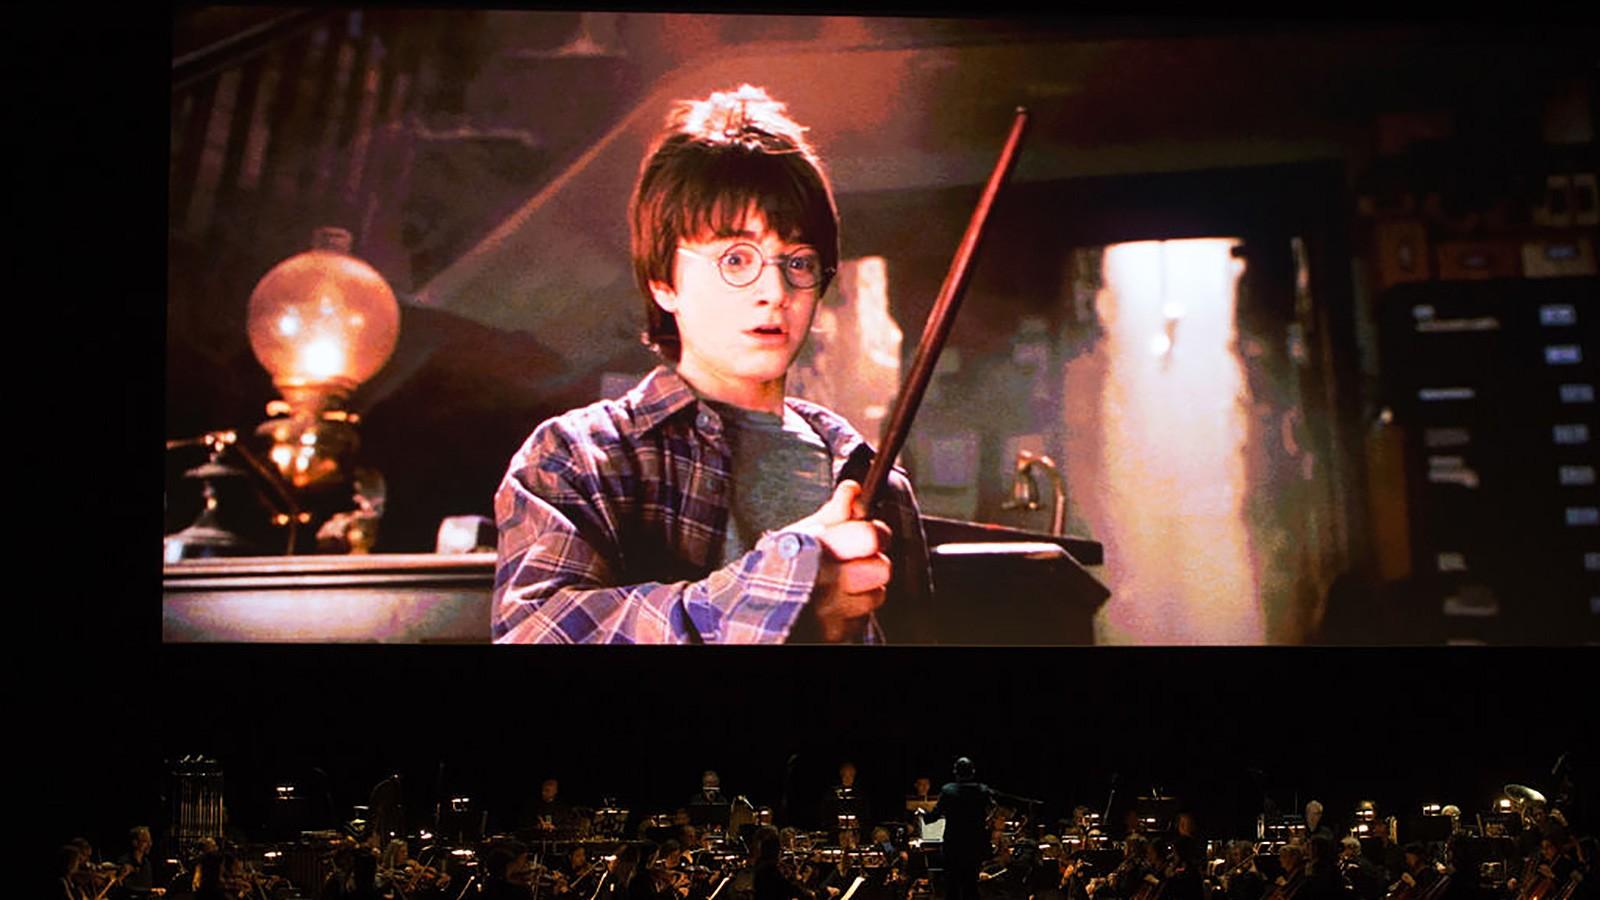 harry potter and sorcerer's stone concert